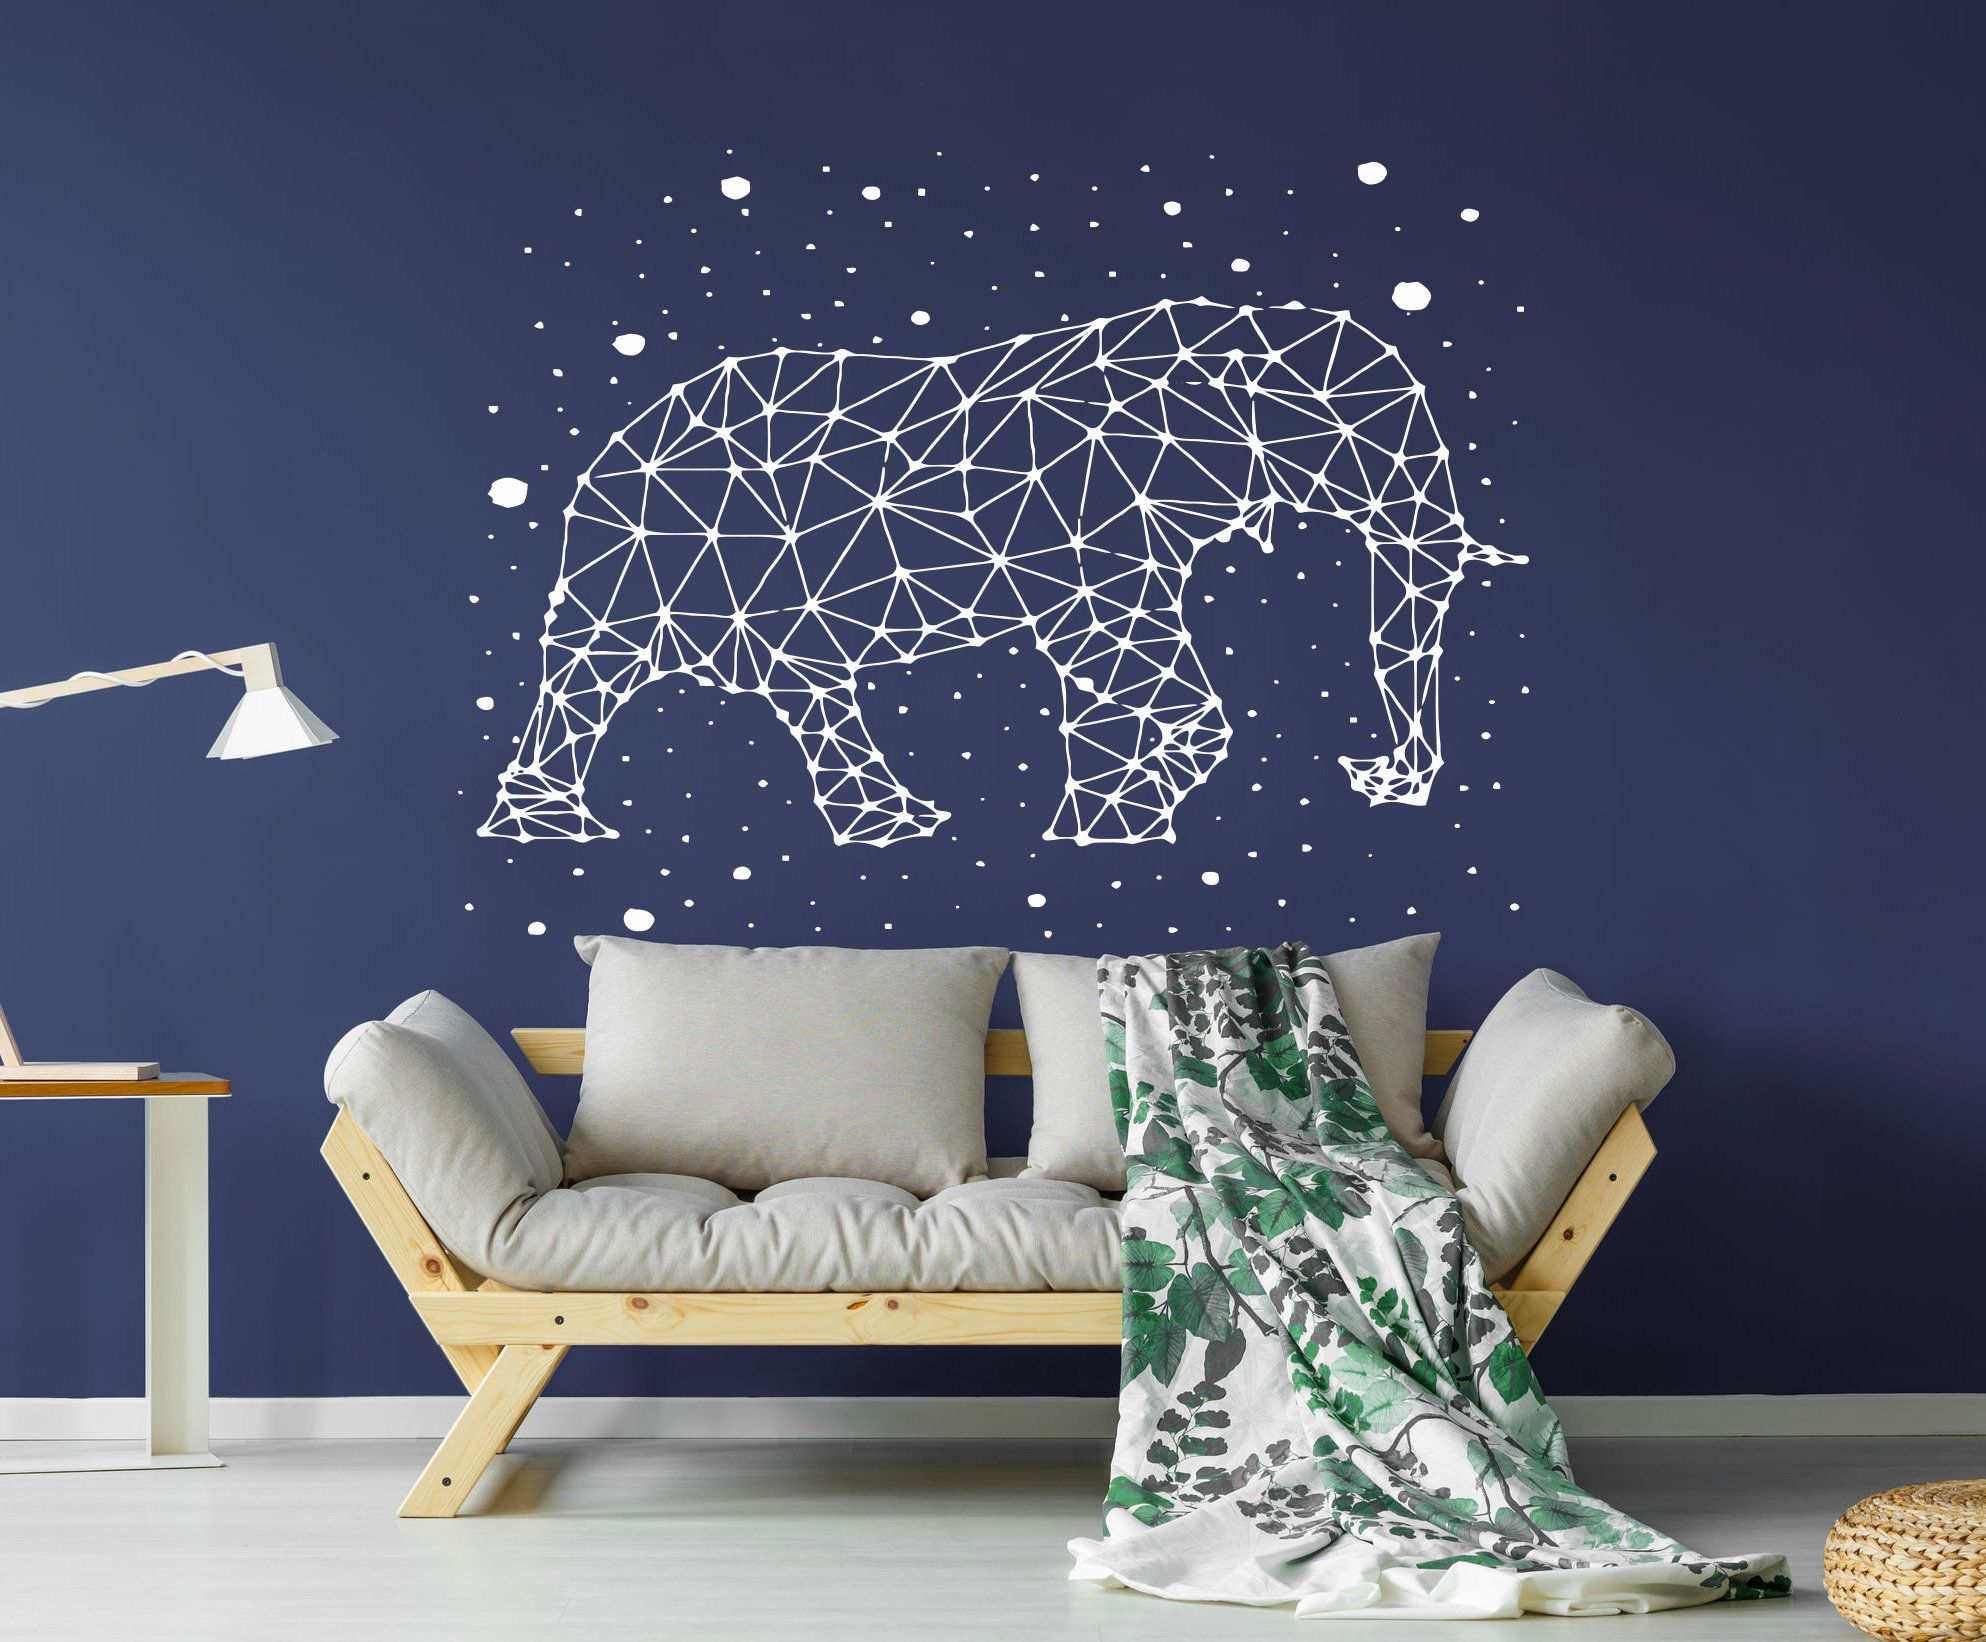 Elephant Stars Constellation Wall Decal Animal Stars Wall Sticker Sky Wall Art C08 Constellation Wall Decal Star Wall Wall Decals